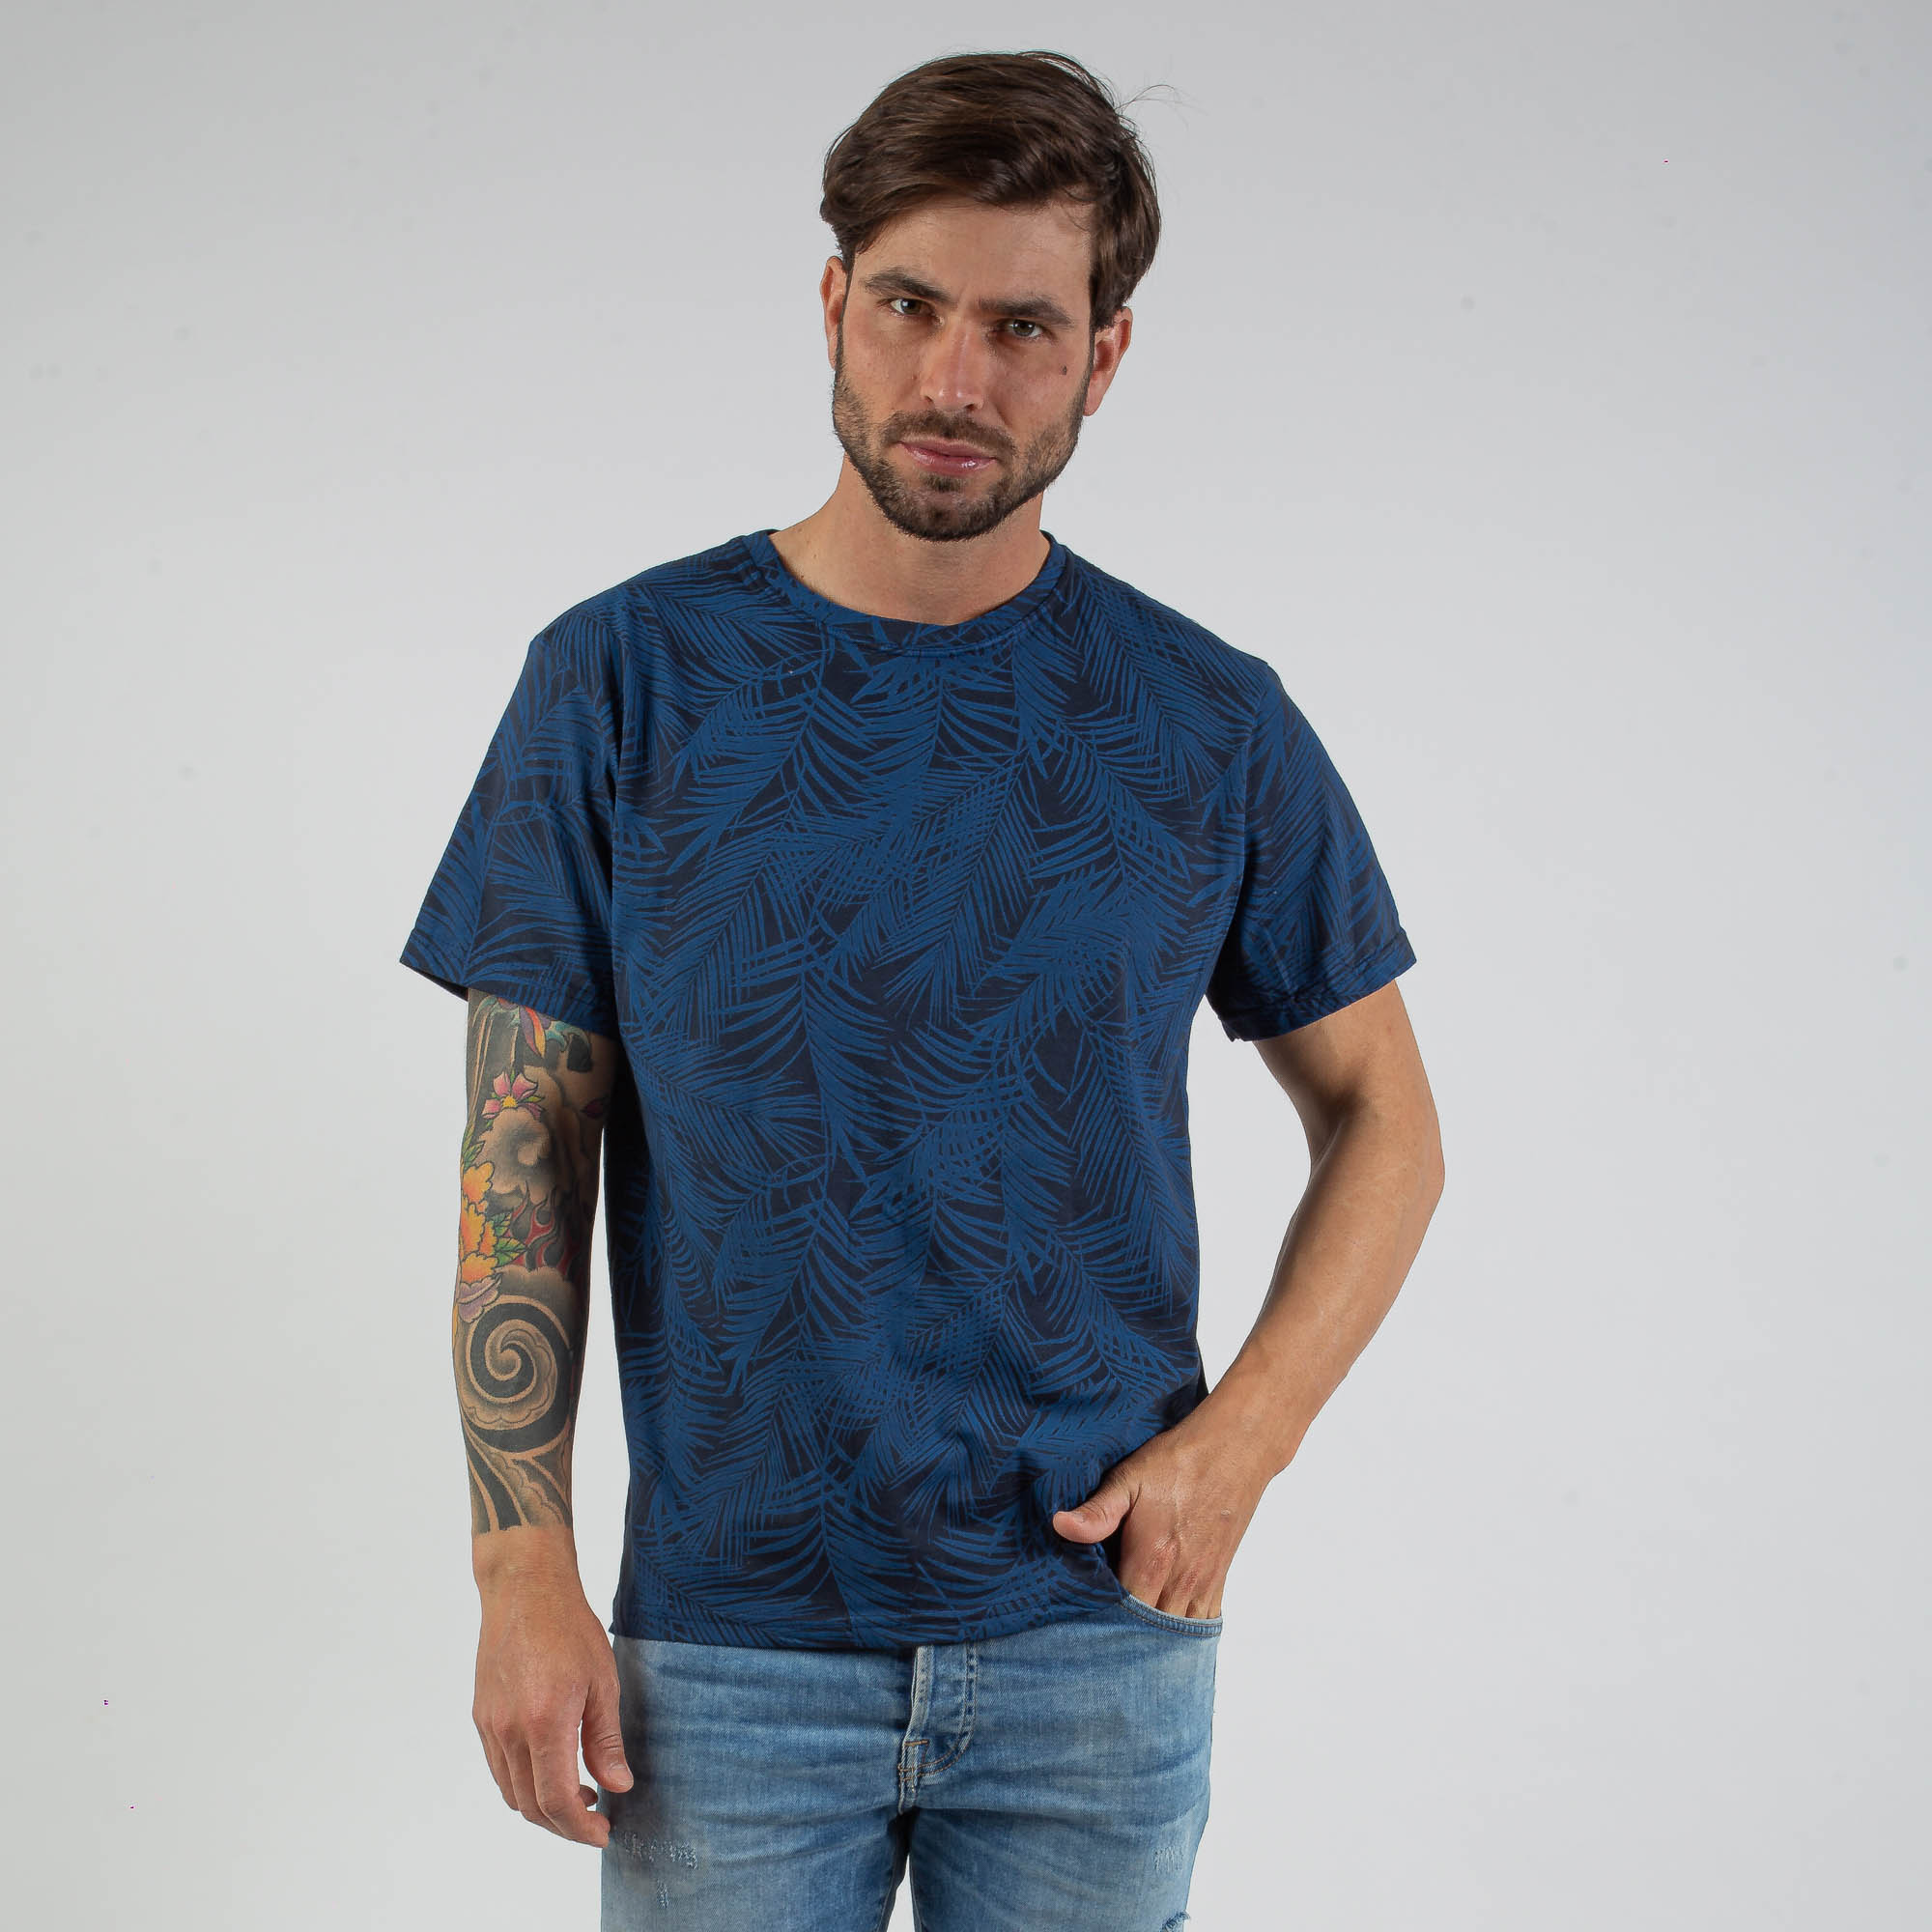 Camiseta Masculina Estampada Folhas Azul